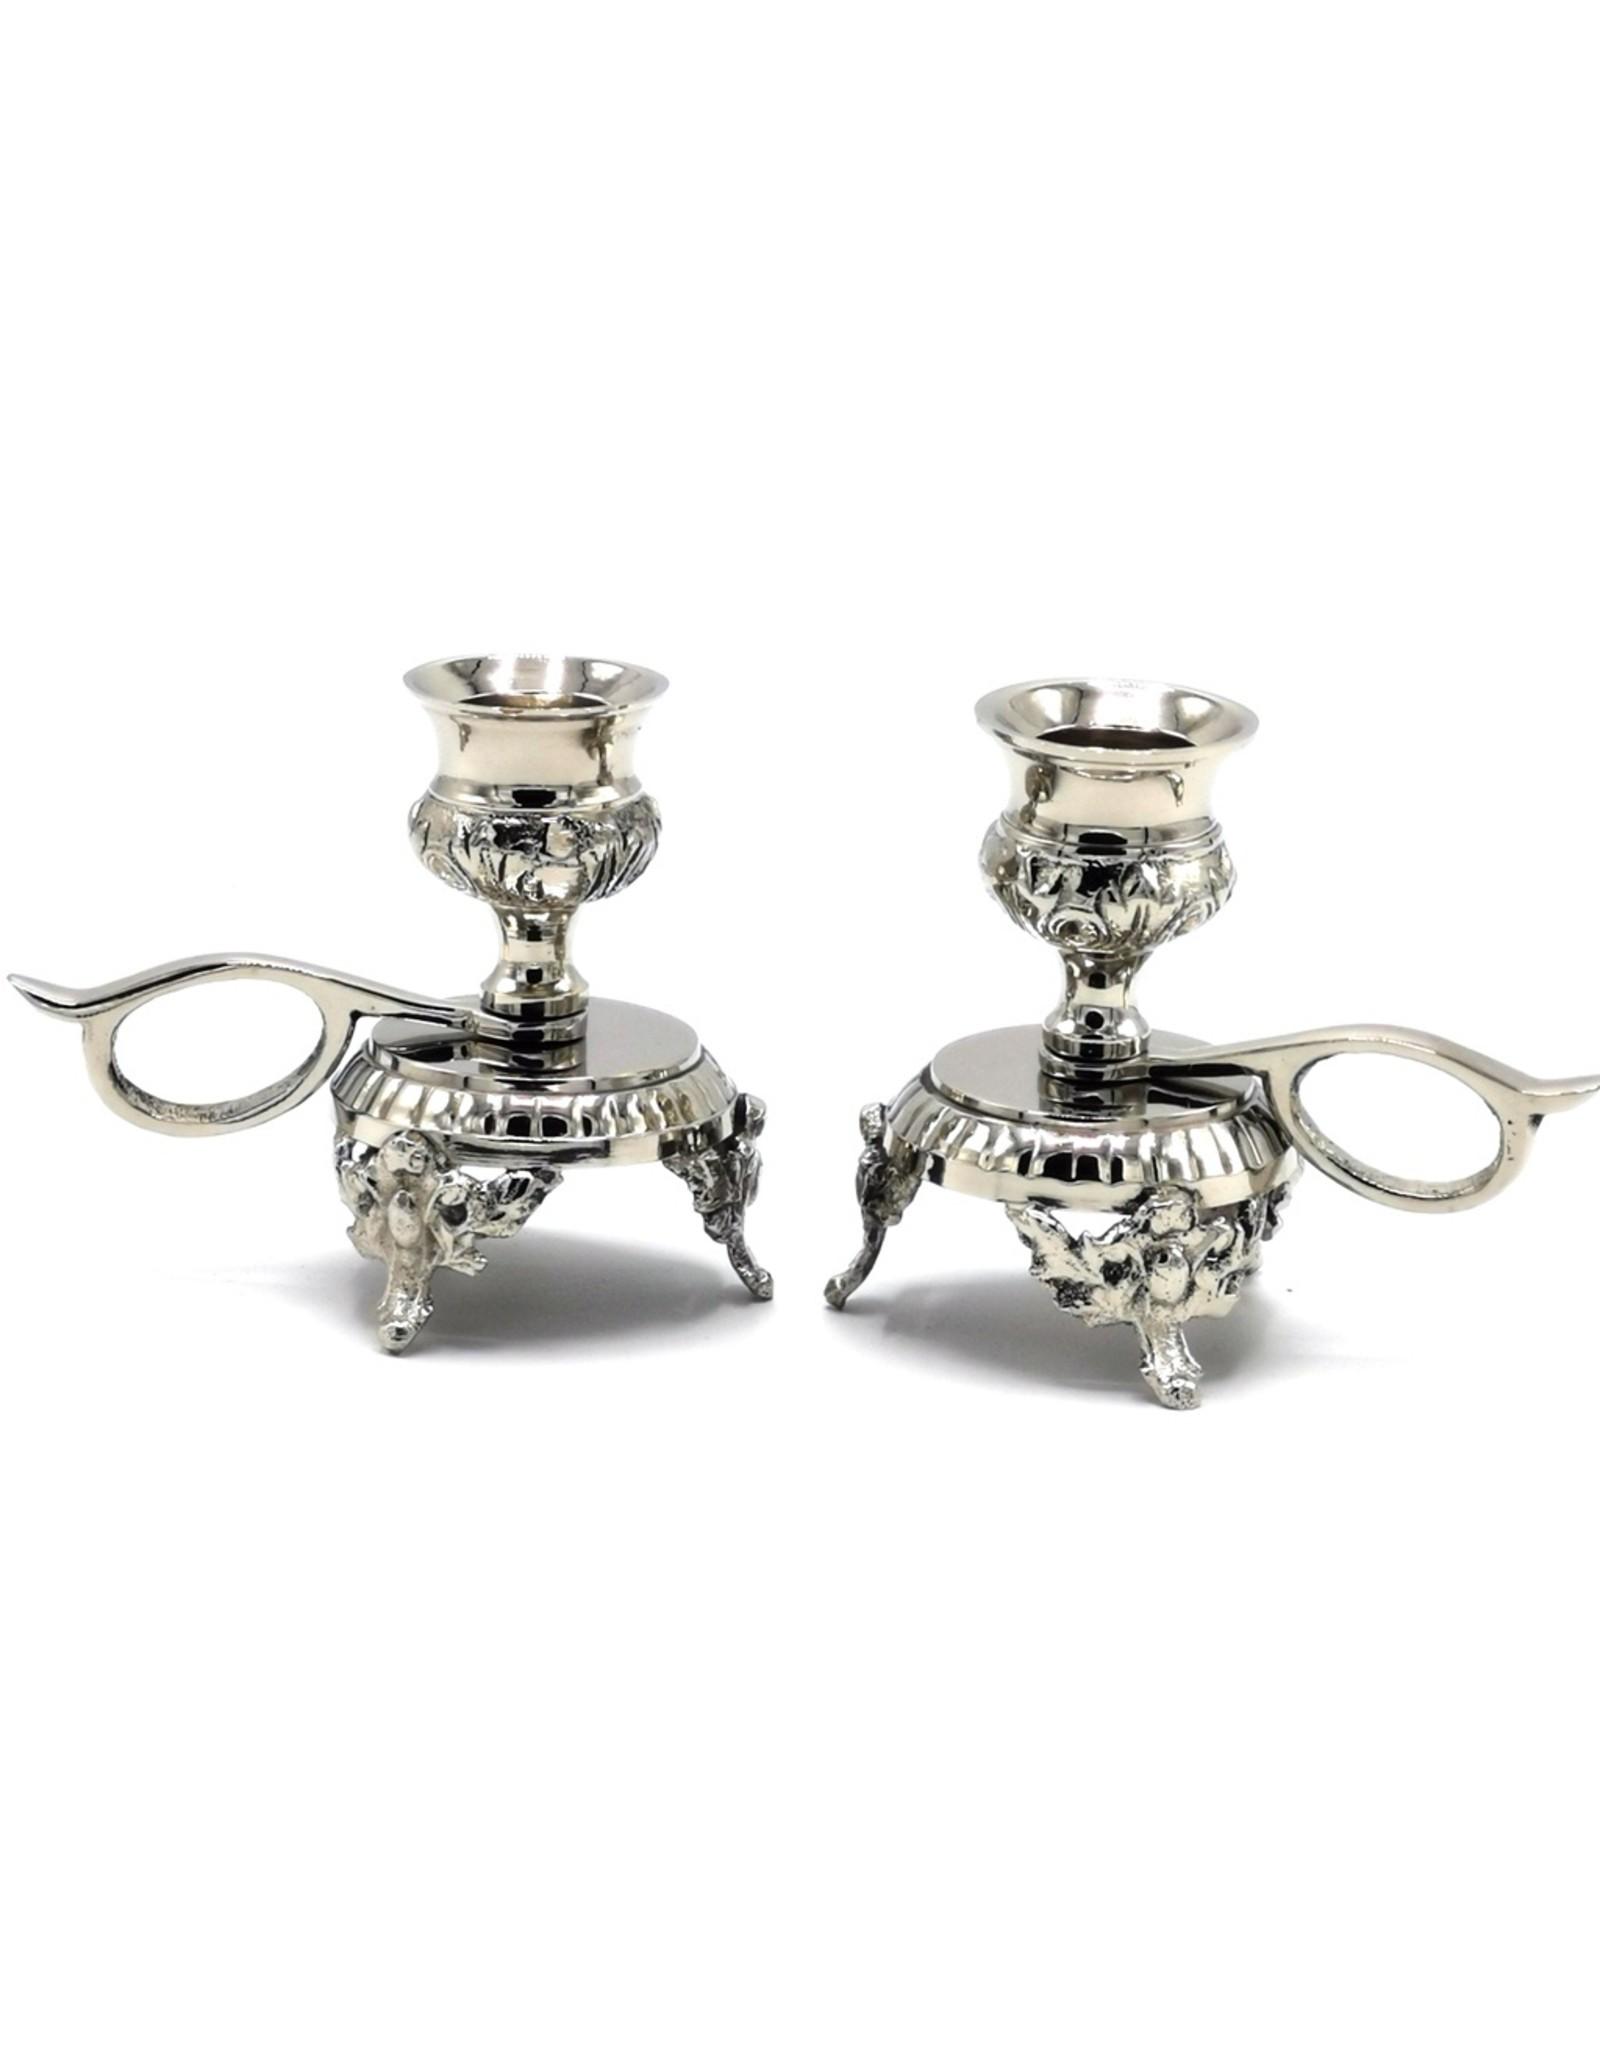 Barok Giftware & Lifestyle - Baroque Mini candlestick - brass, silver color